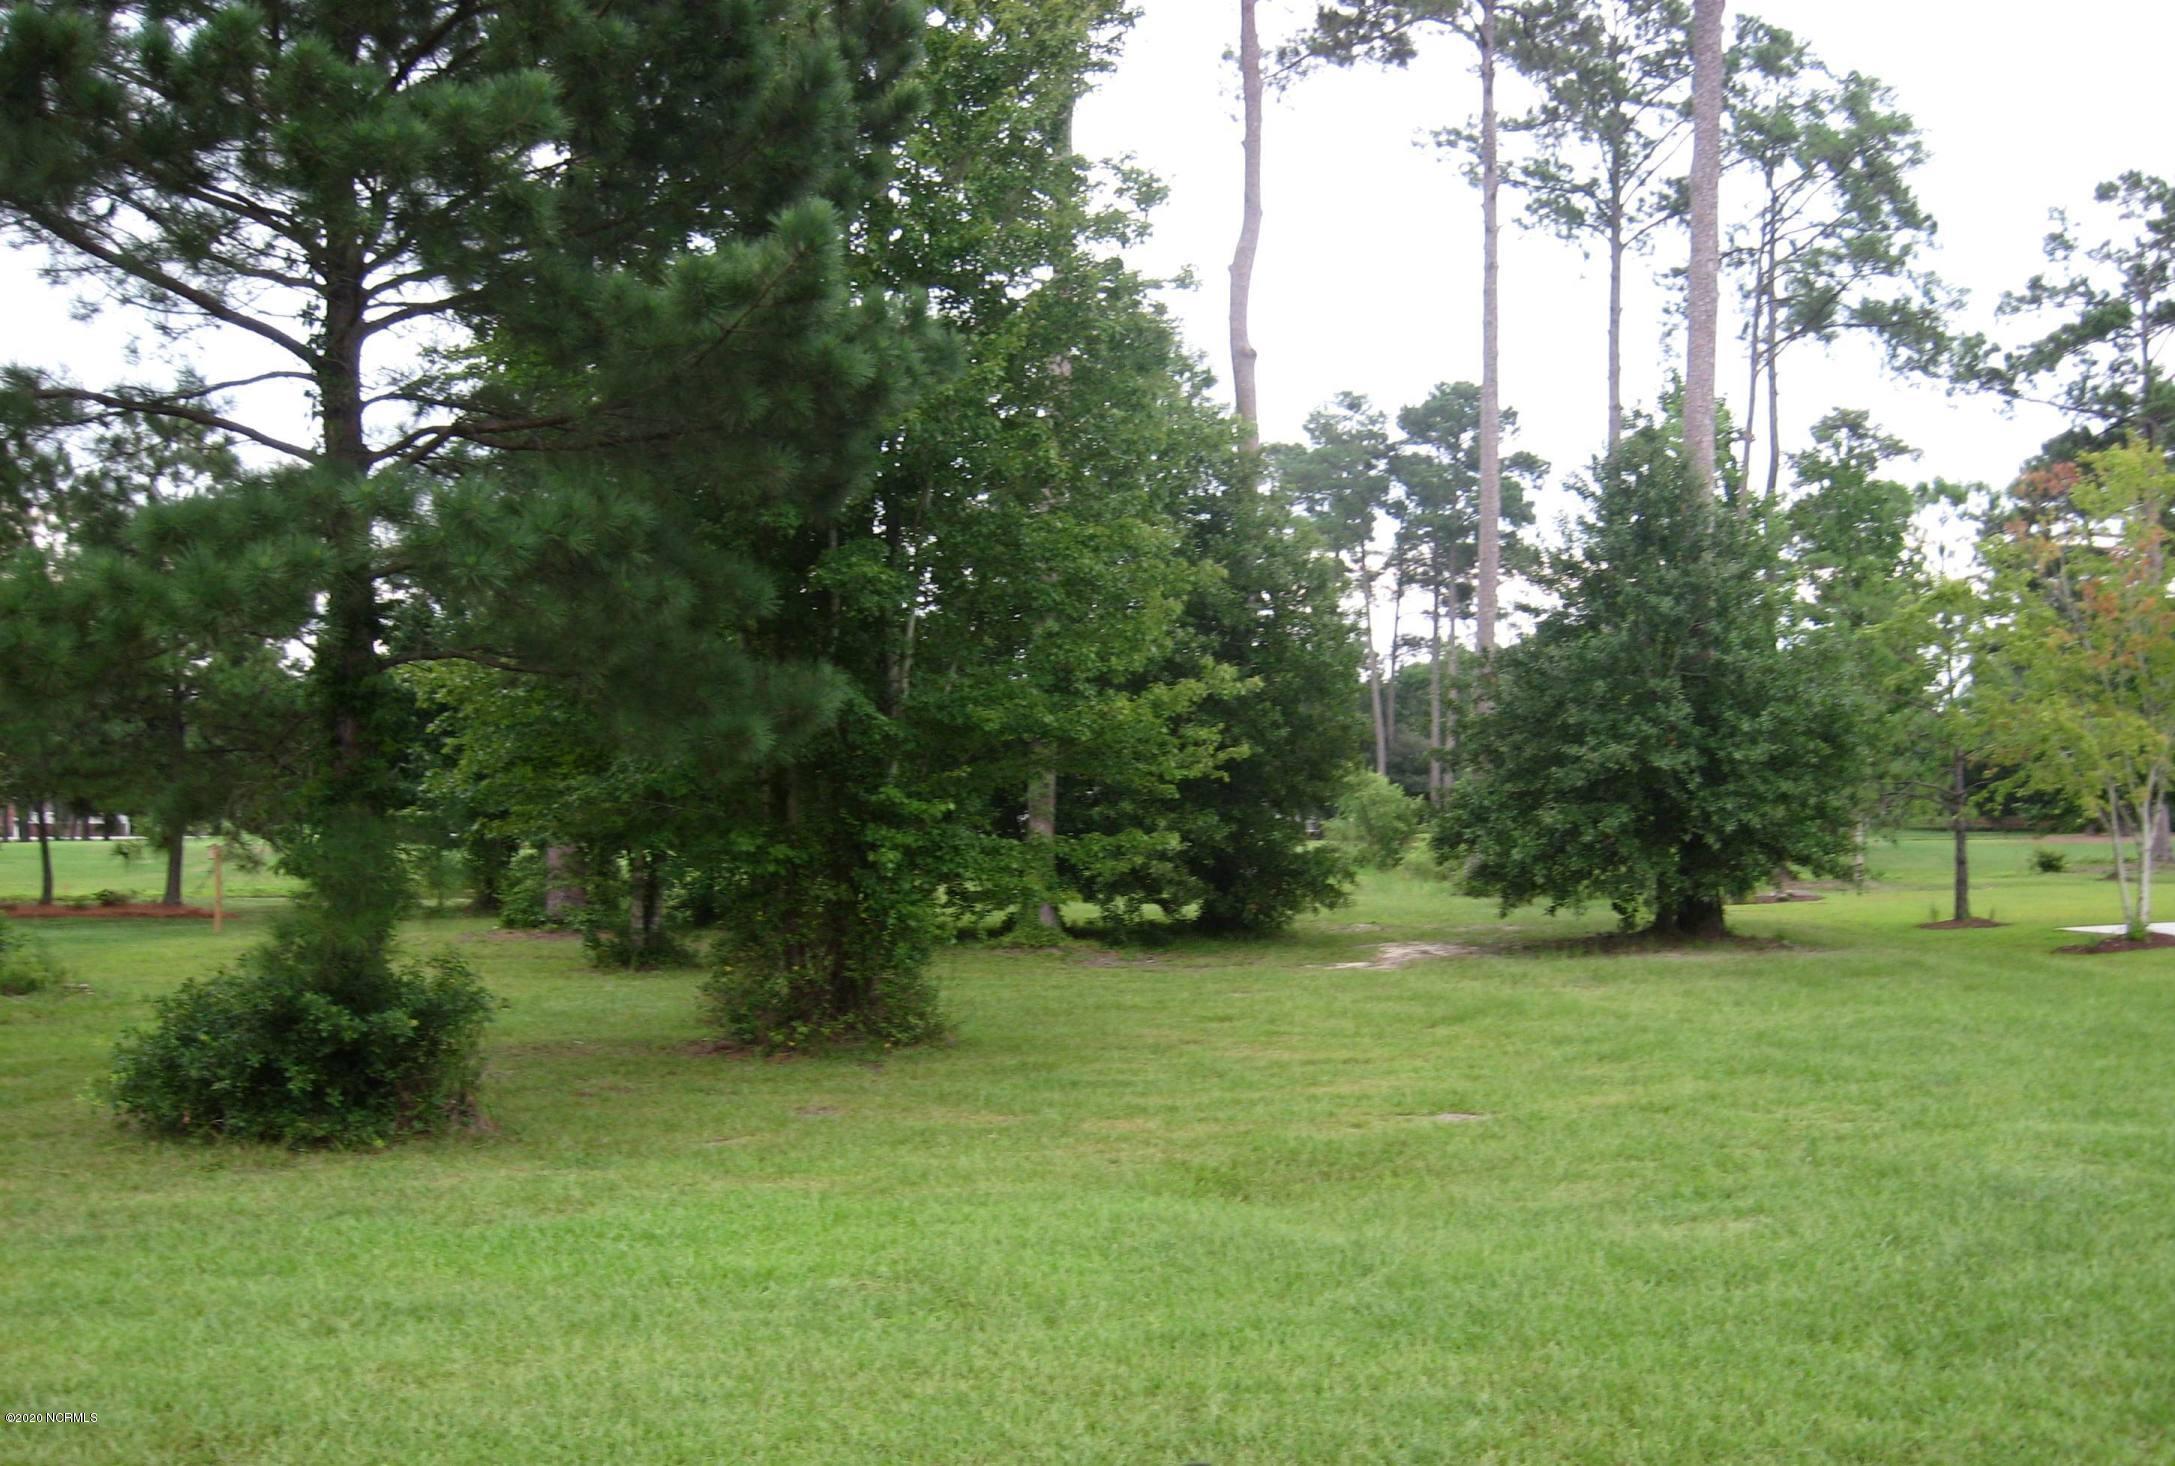 771 Wild Oak Lane, Calabash, North Carolina 28467, ,Residential land,For sale,Wild Oak,100159021